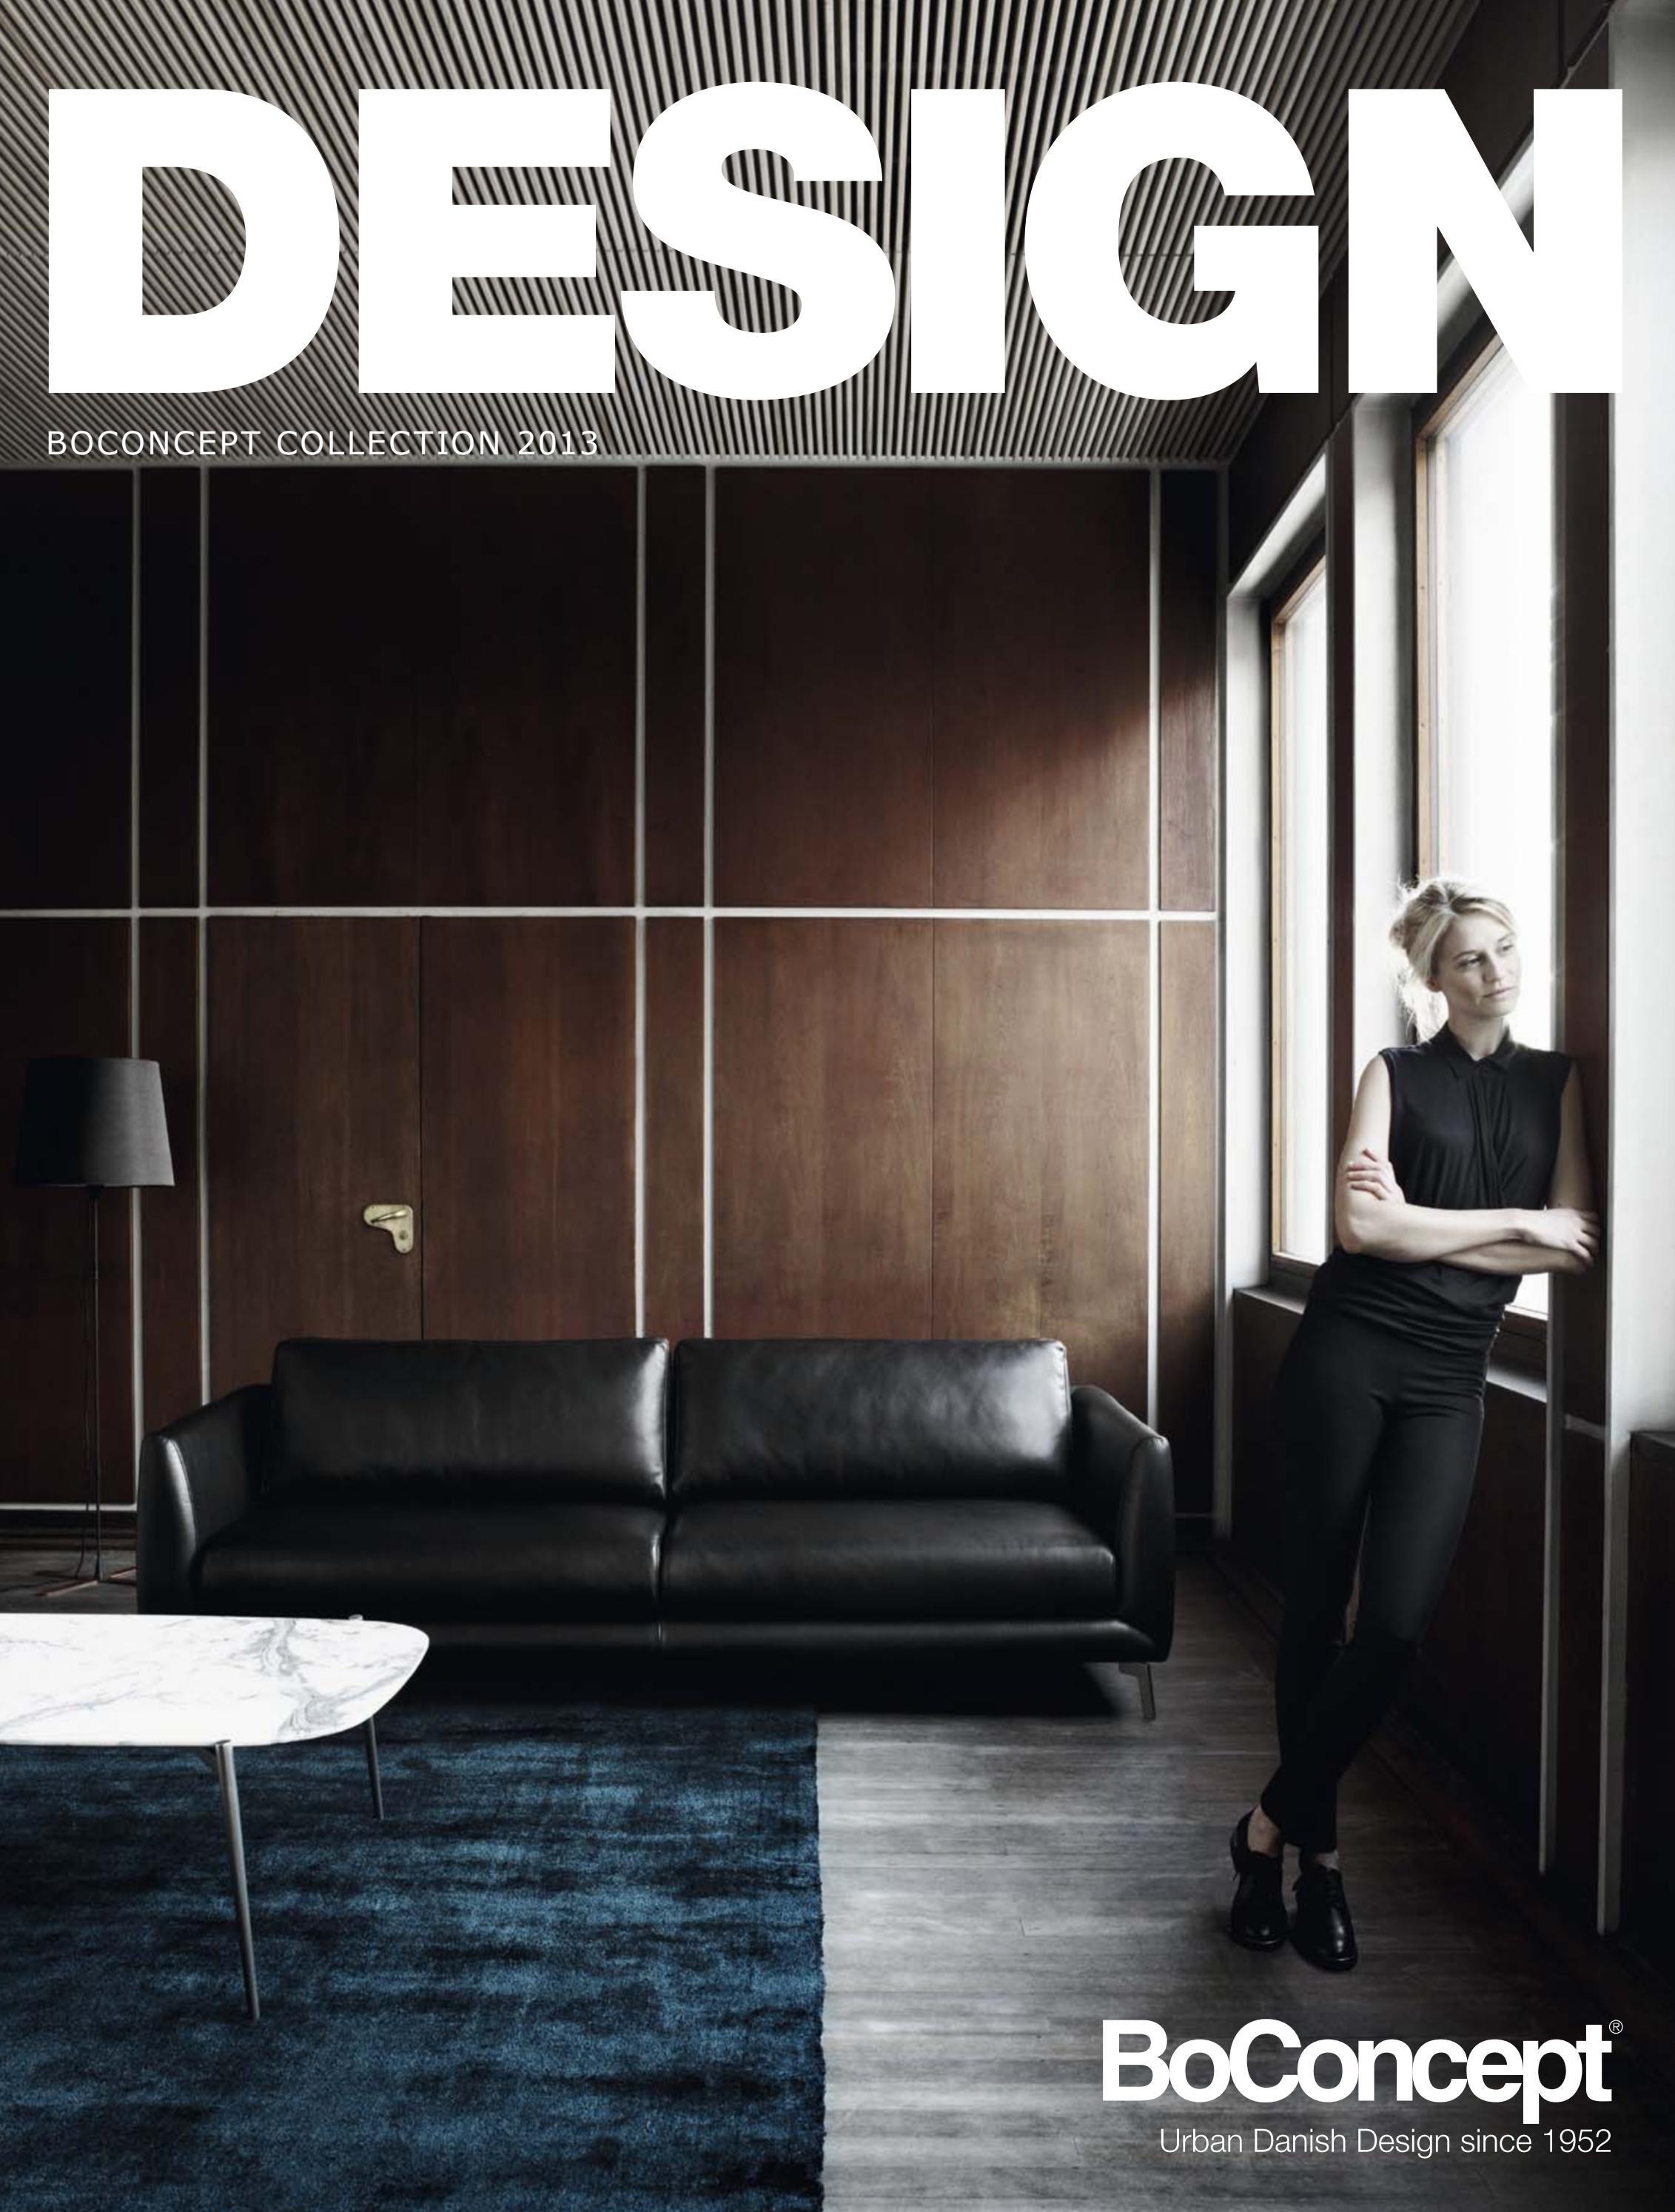 boconcept by luis pimienta issuu. Black Bedroom Furniture Sets. Home Design Ideas